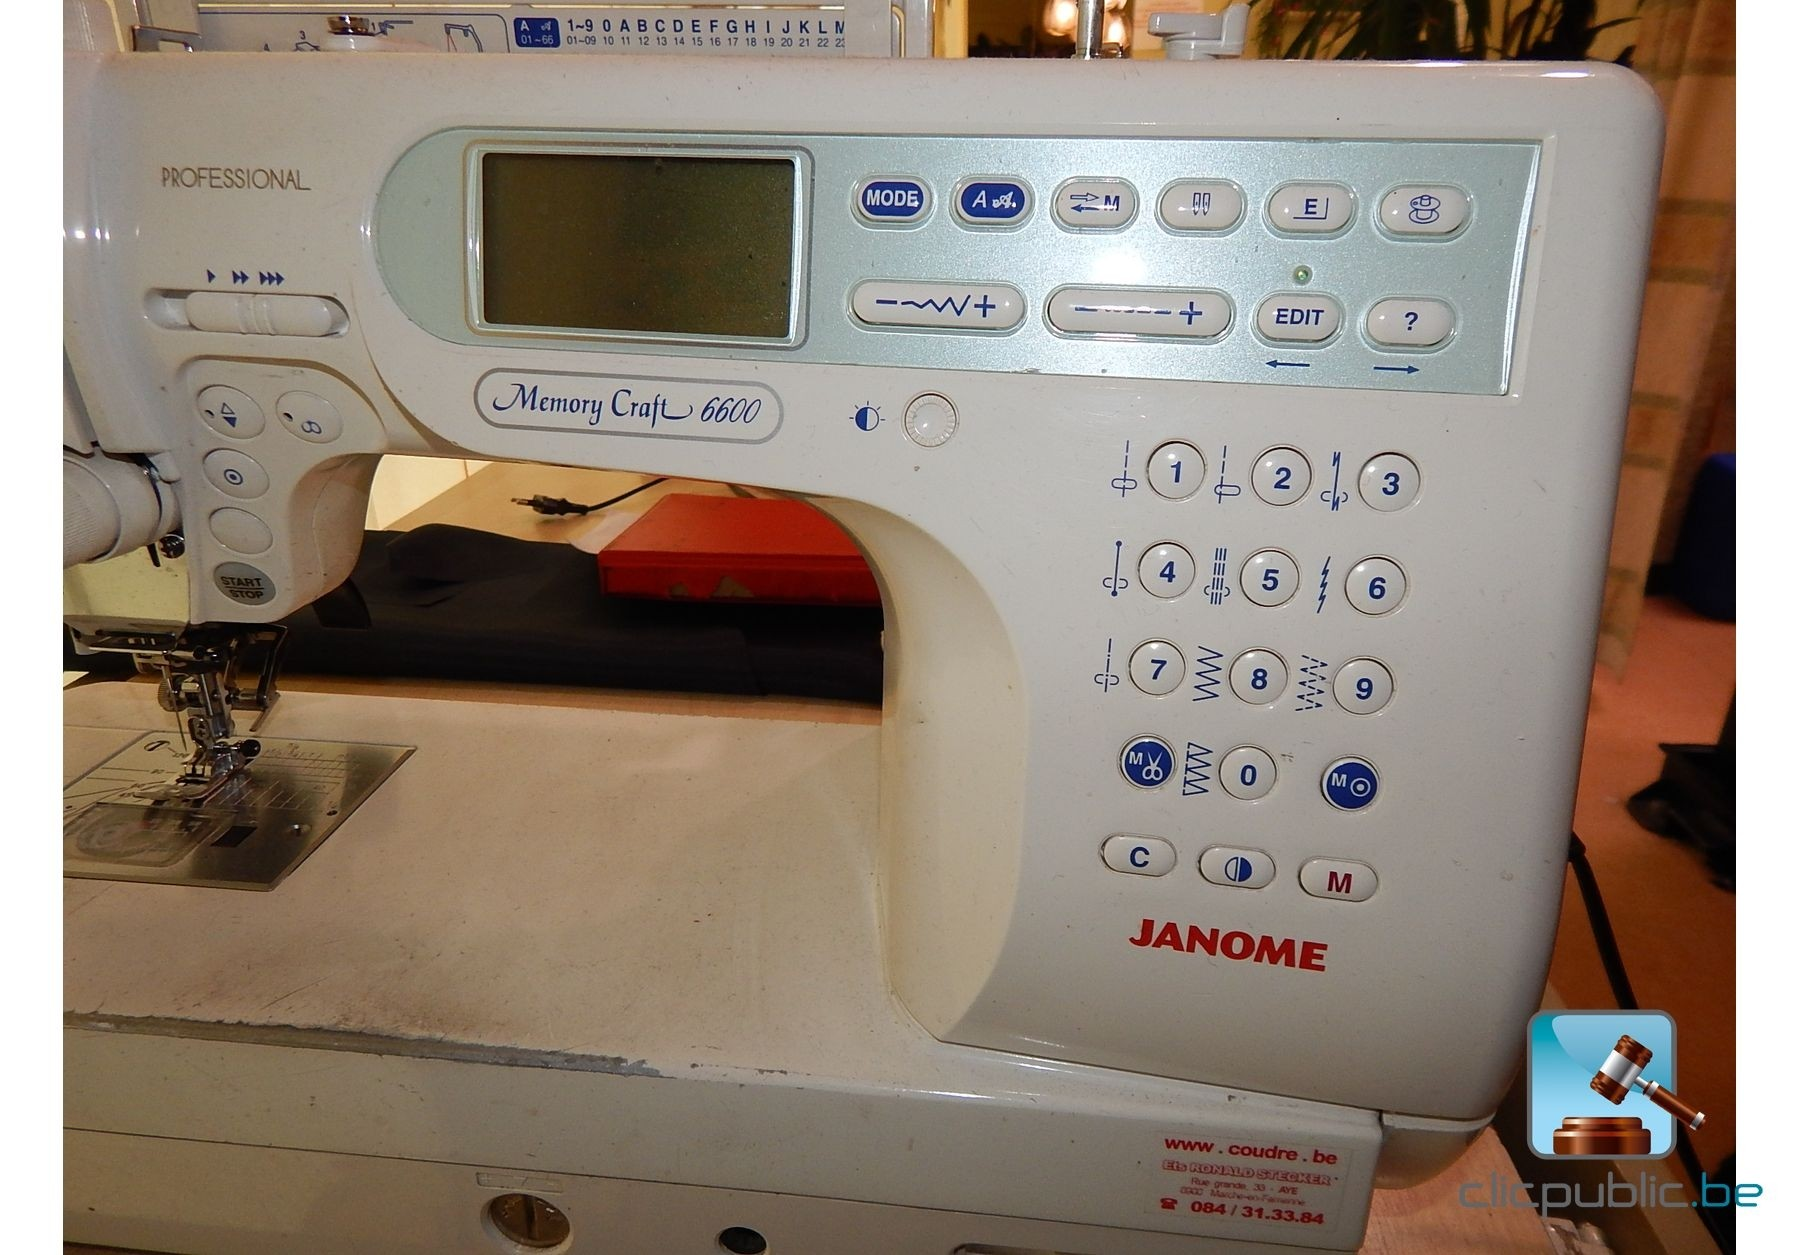 Machine coudre janome memory craft 6600 vendre sur for Machine a coudre 217 occasion